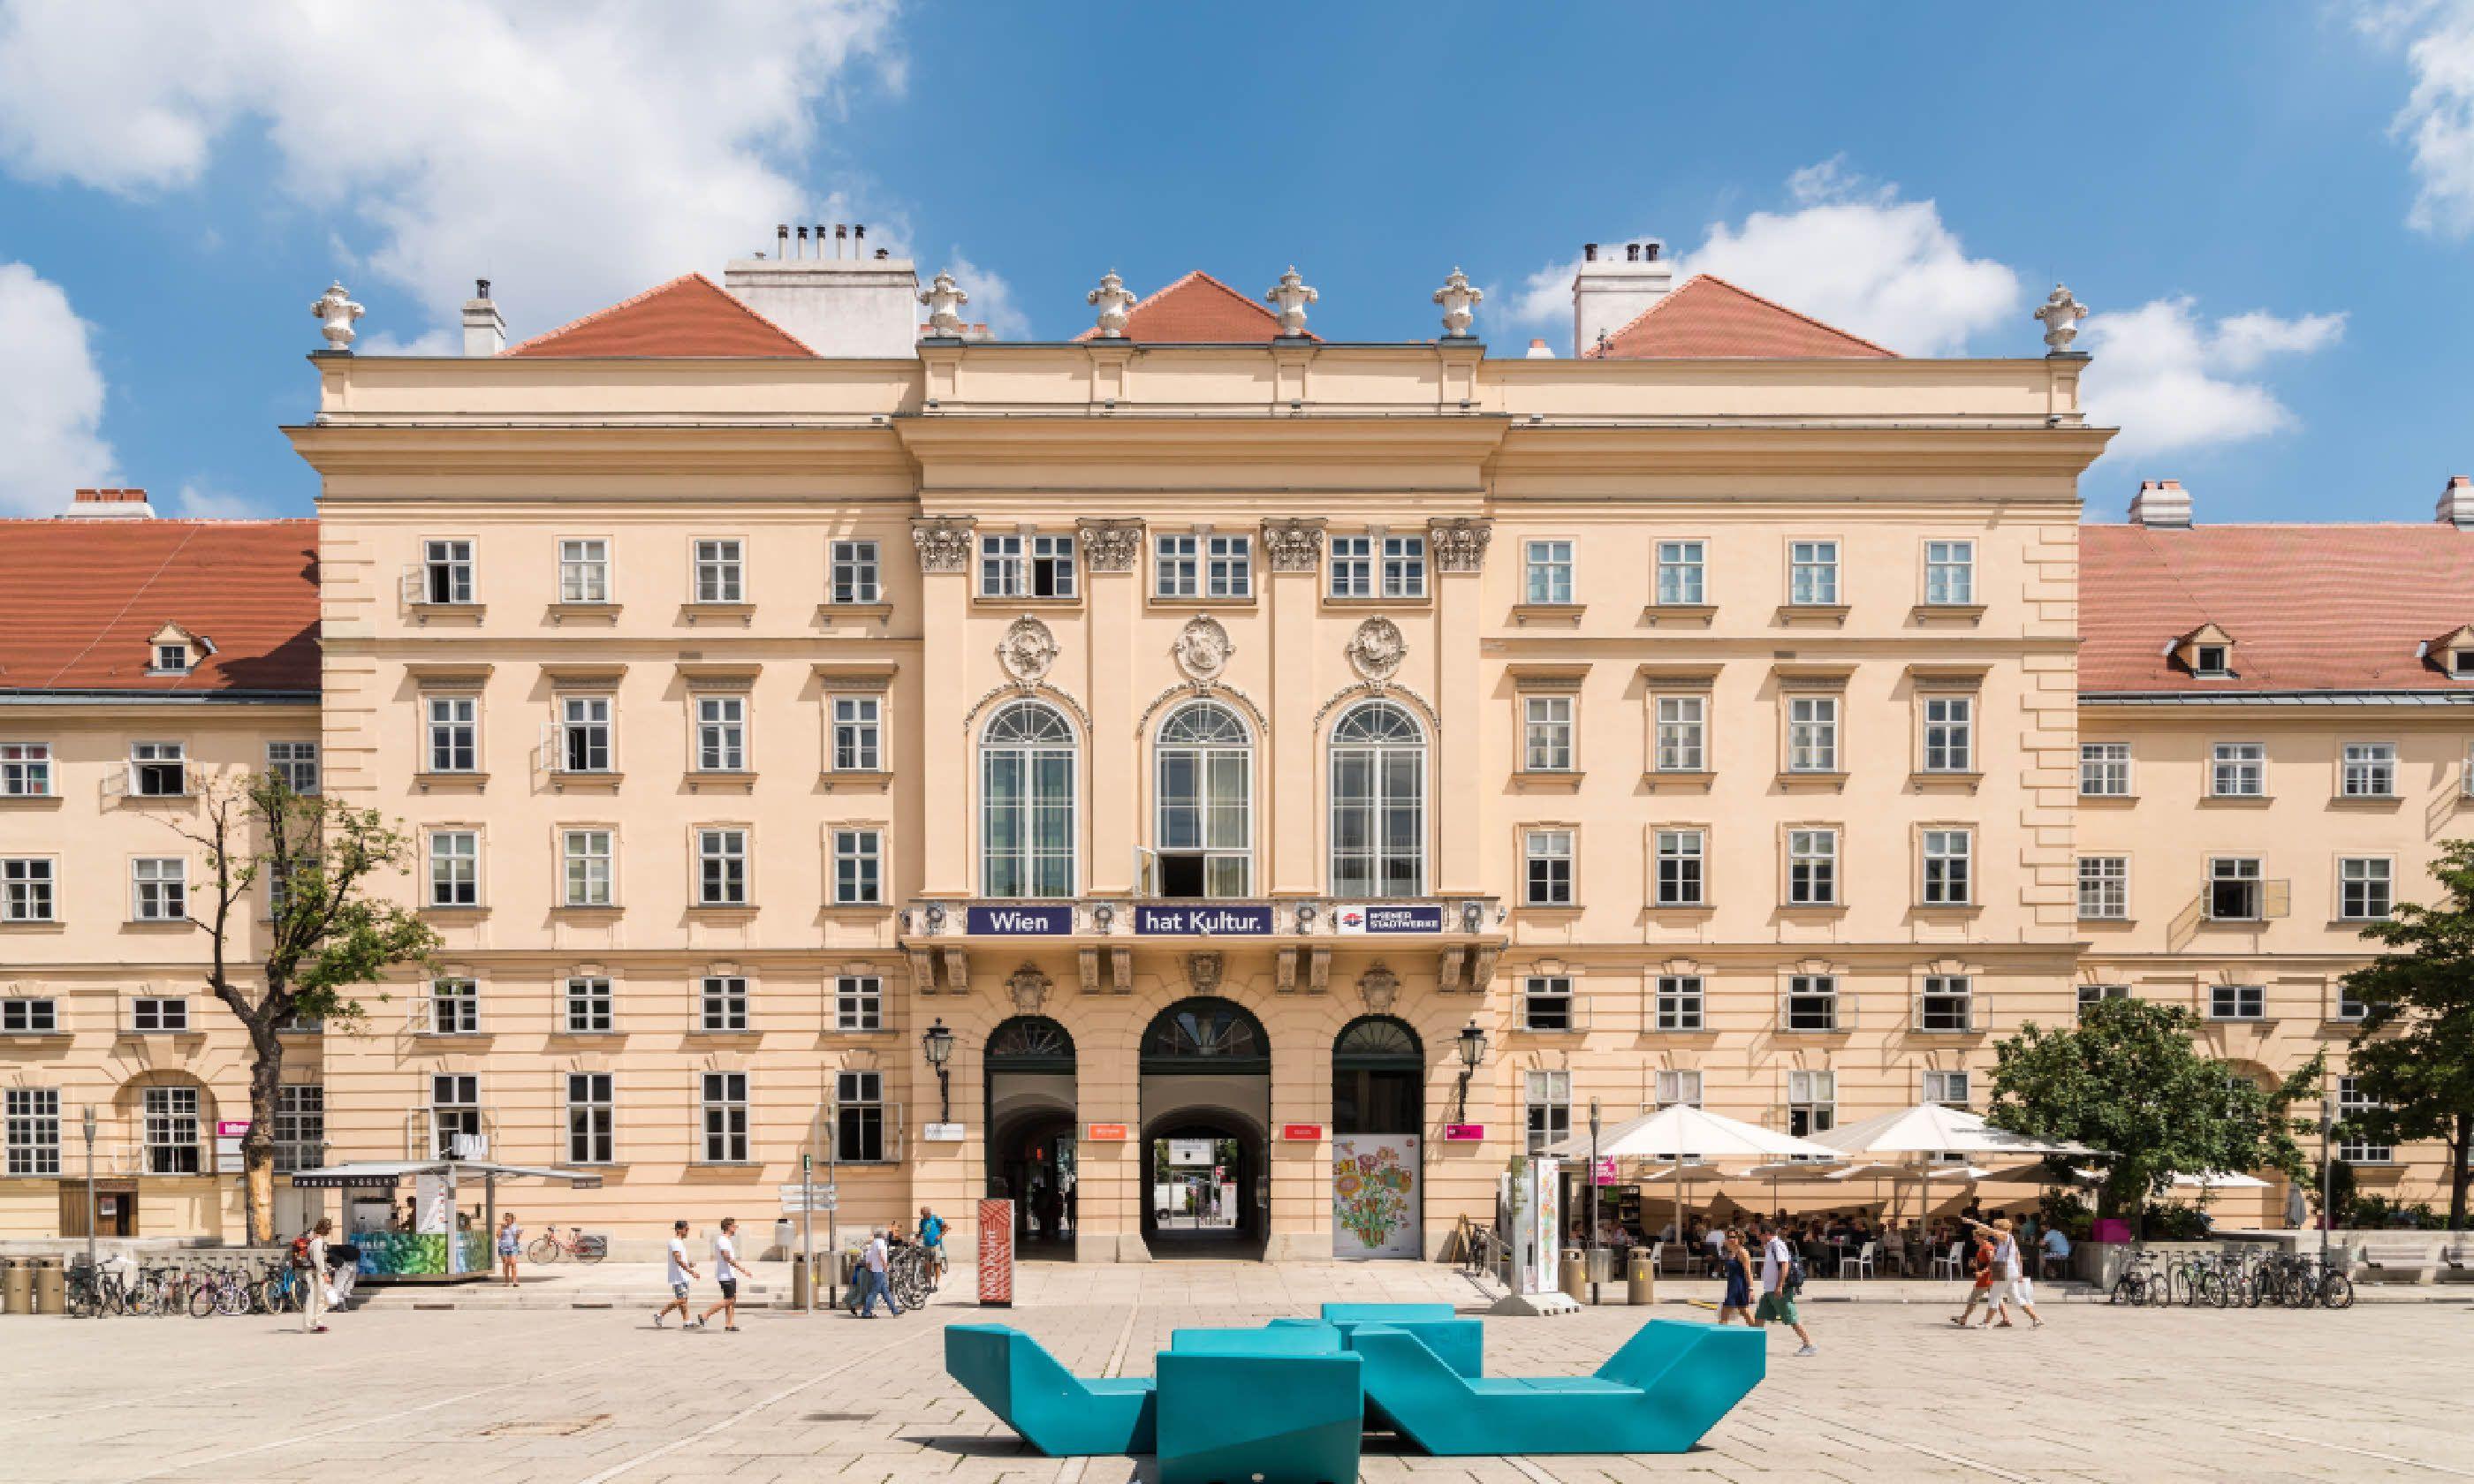 The MuseumQuartier, Vienna (Dreamstime)